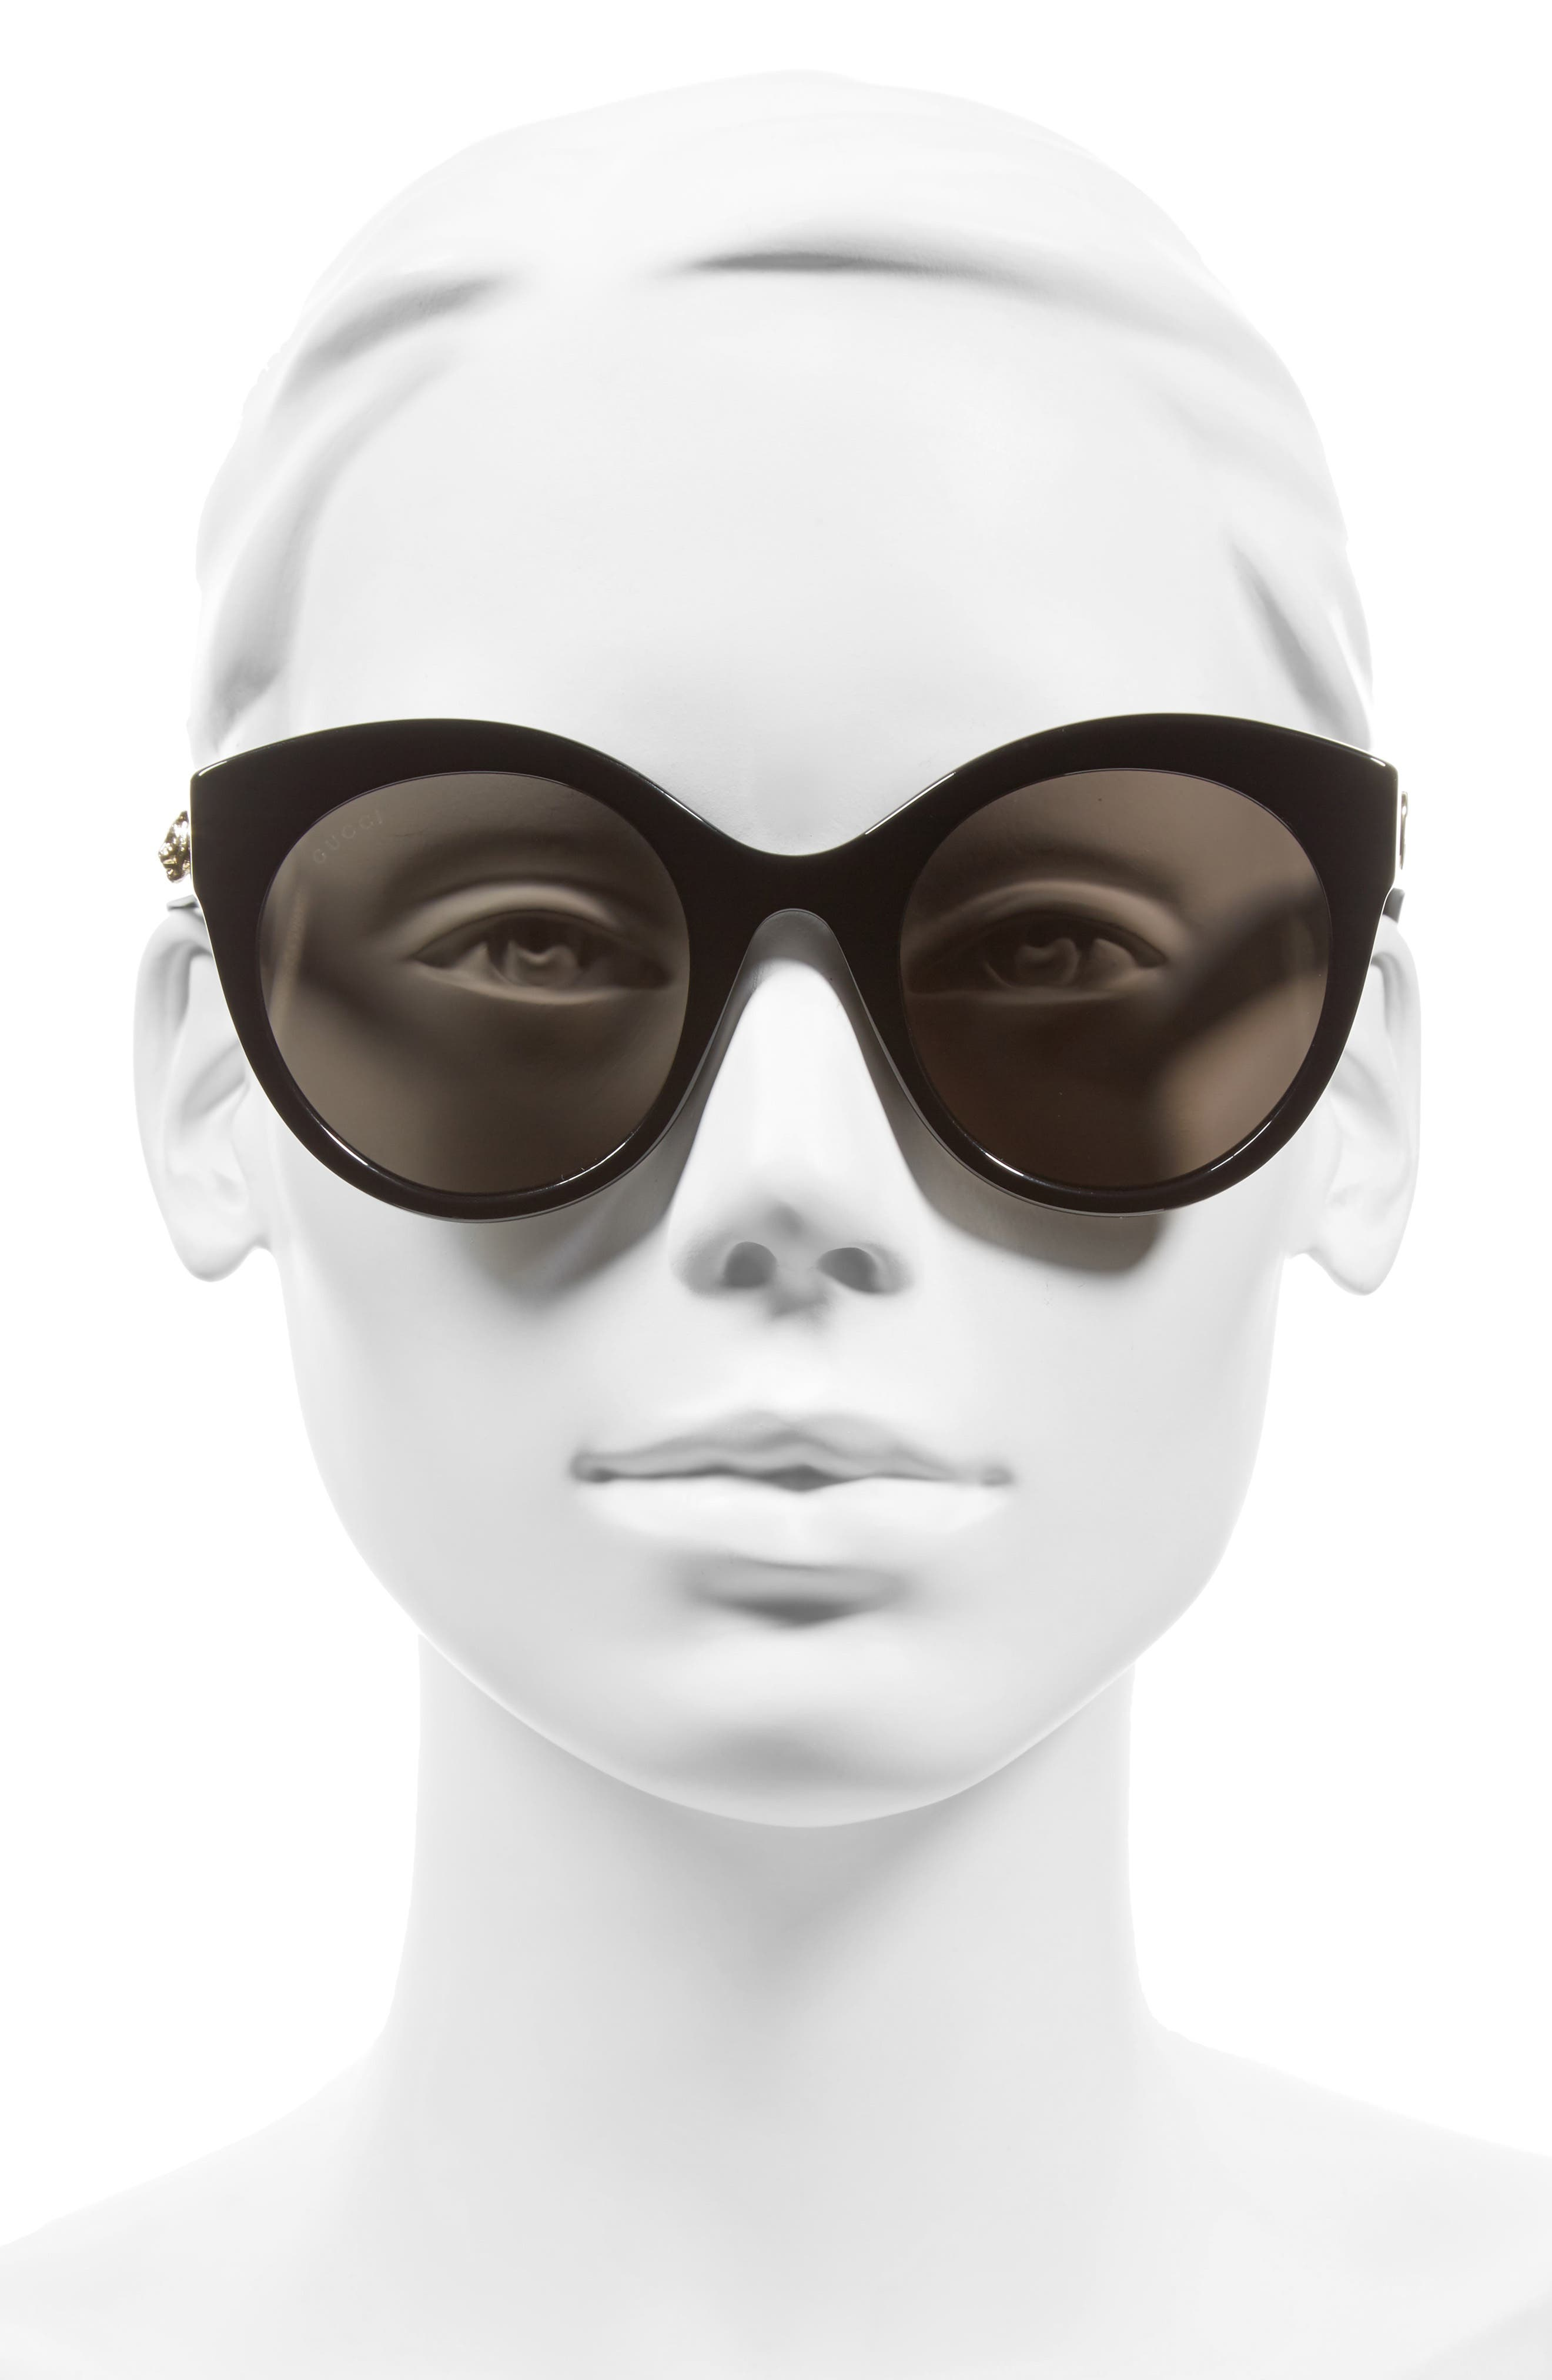 52mm Cat Eye Sunglasses,                             Alternate thumbnail 3, color,                             001